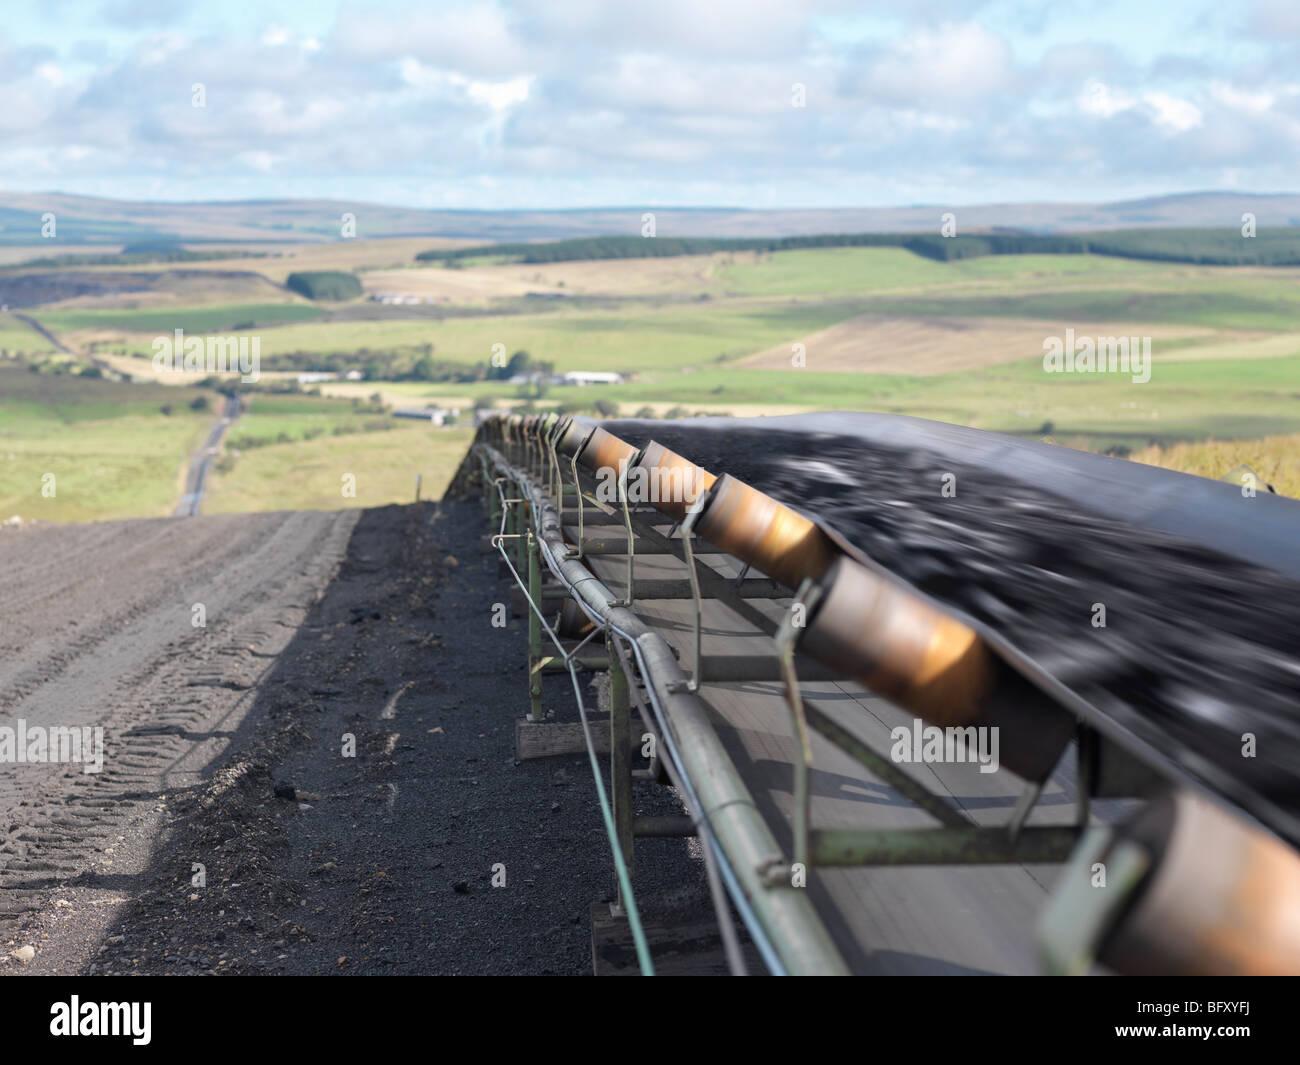 Mined Coal Traveling on Conveyor Belt - Stock Image